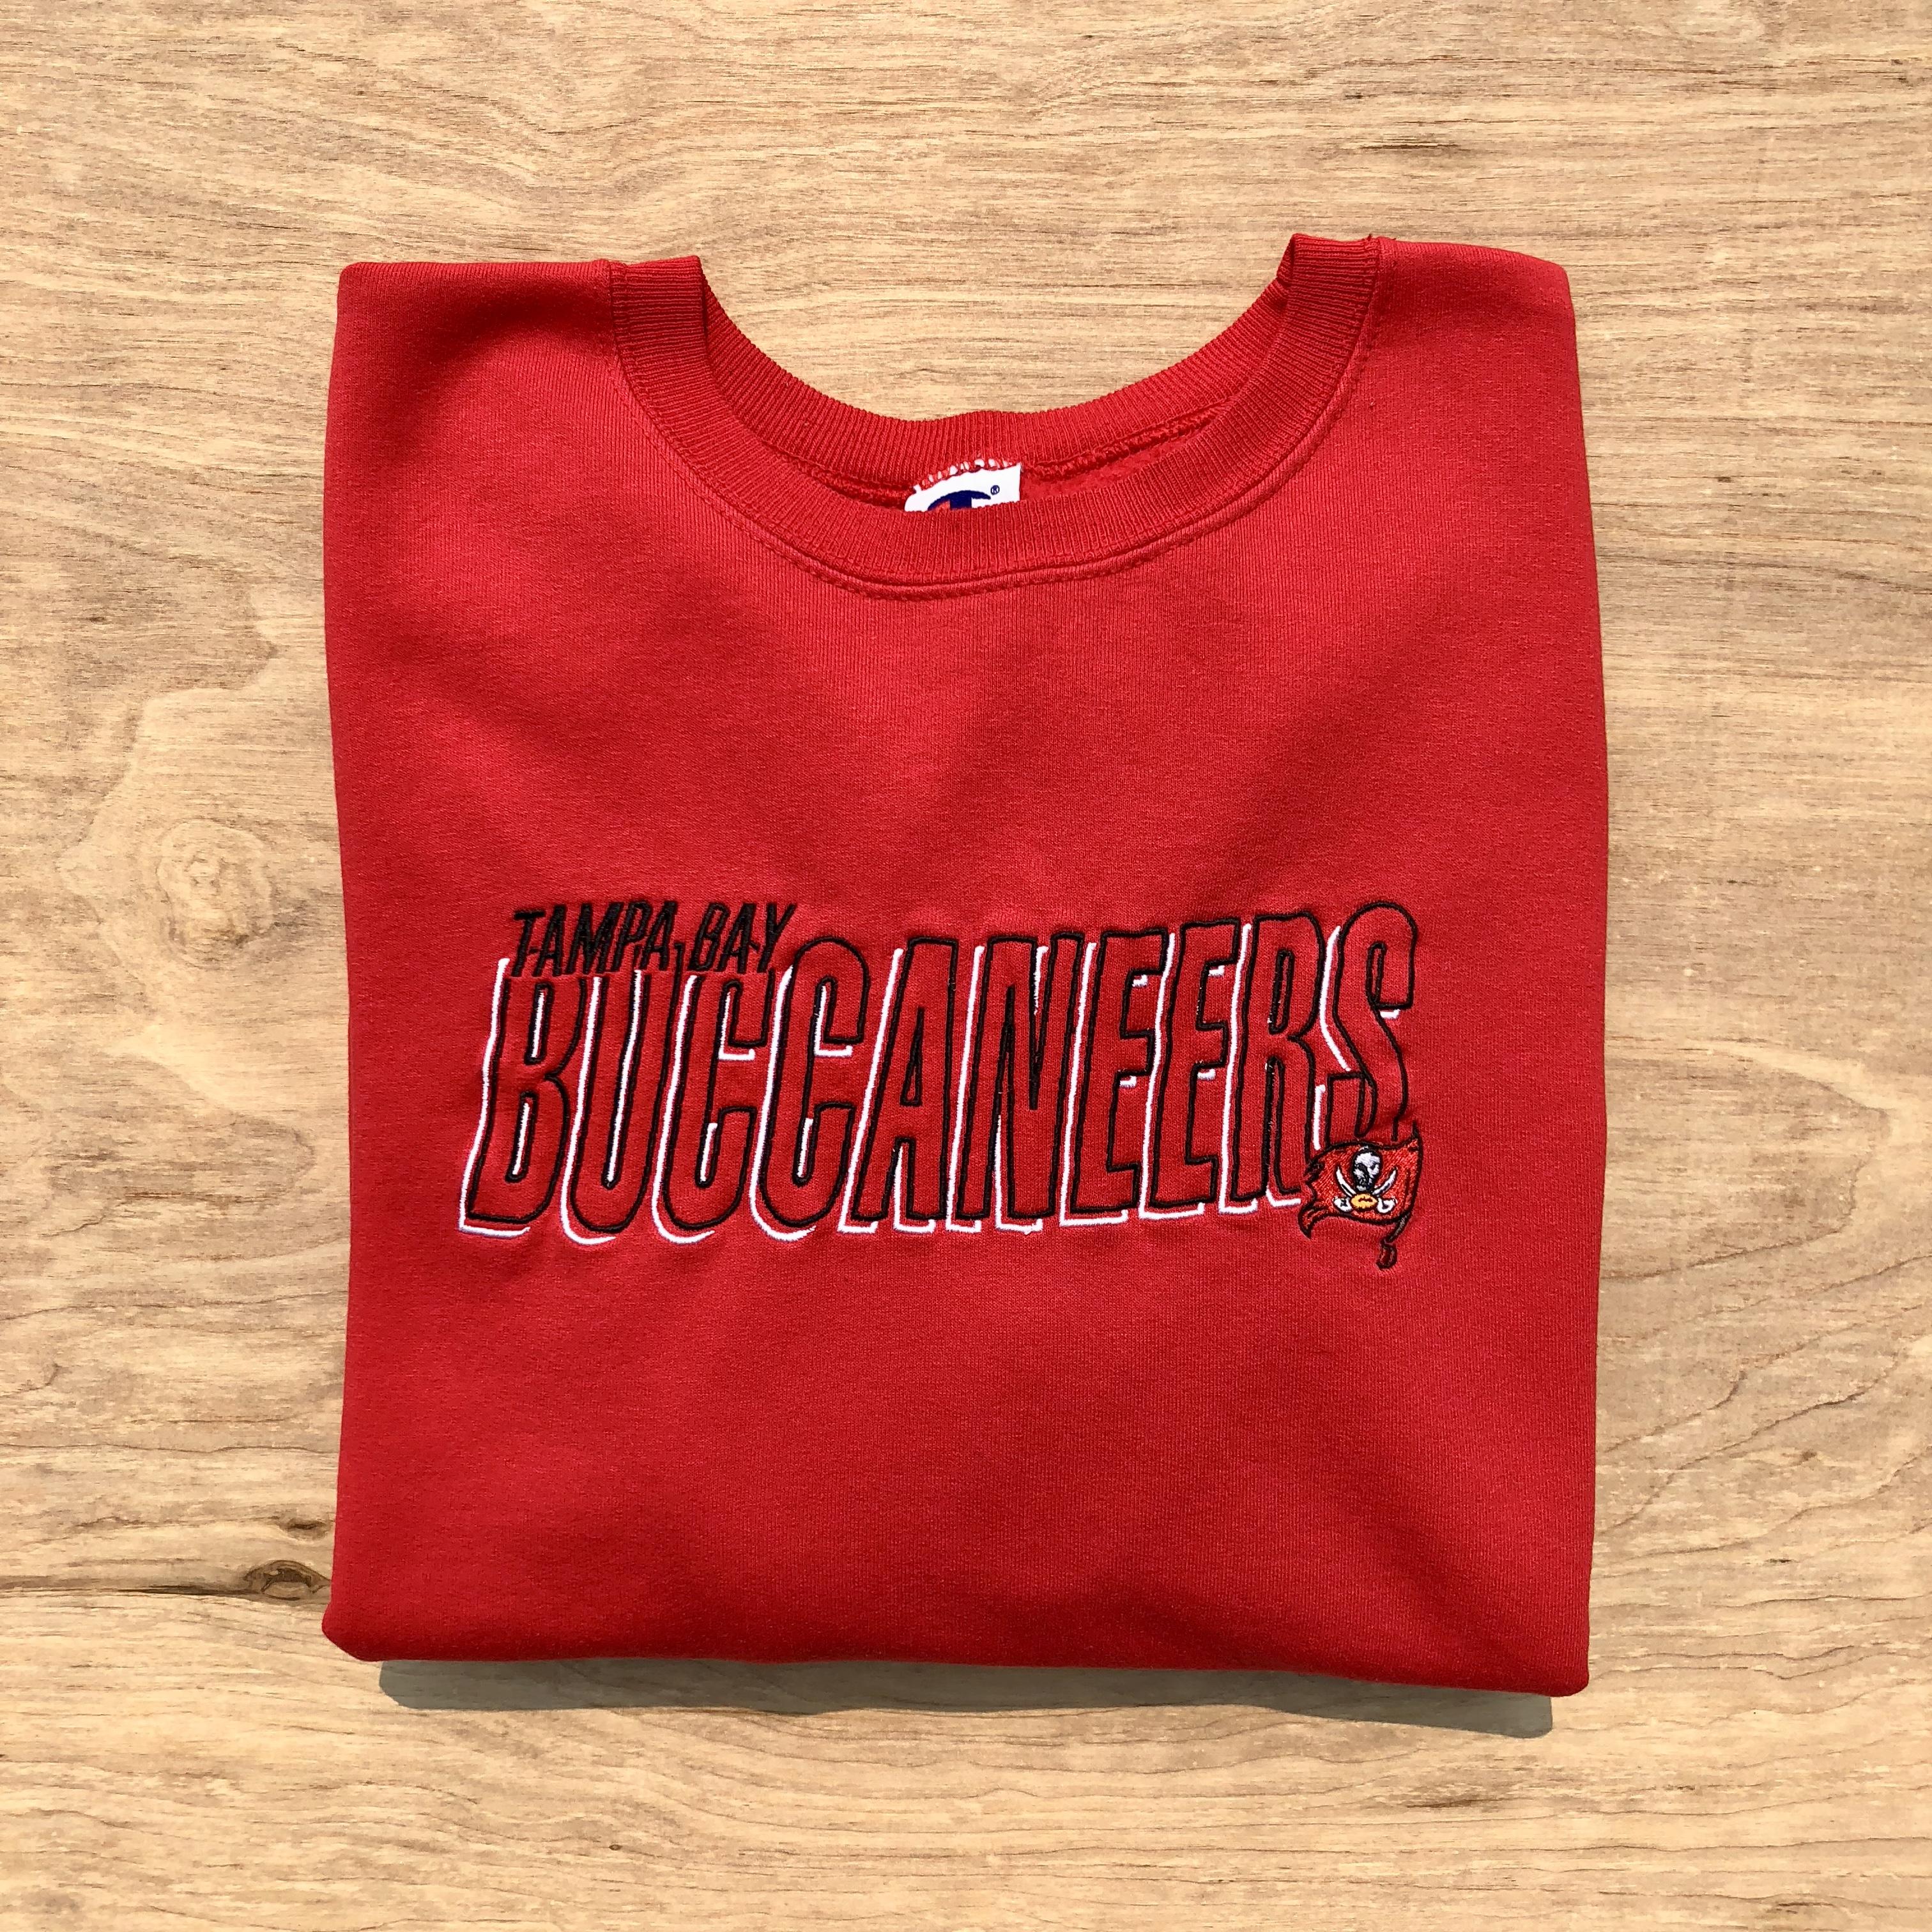 Vintage 90s Tampa Bay Buccaneers Football Crewneck Sweatshirt | Grailed  for cheap